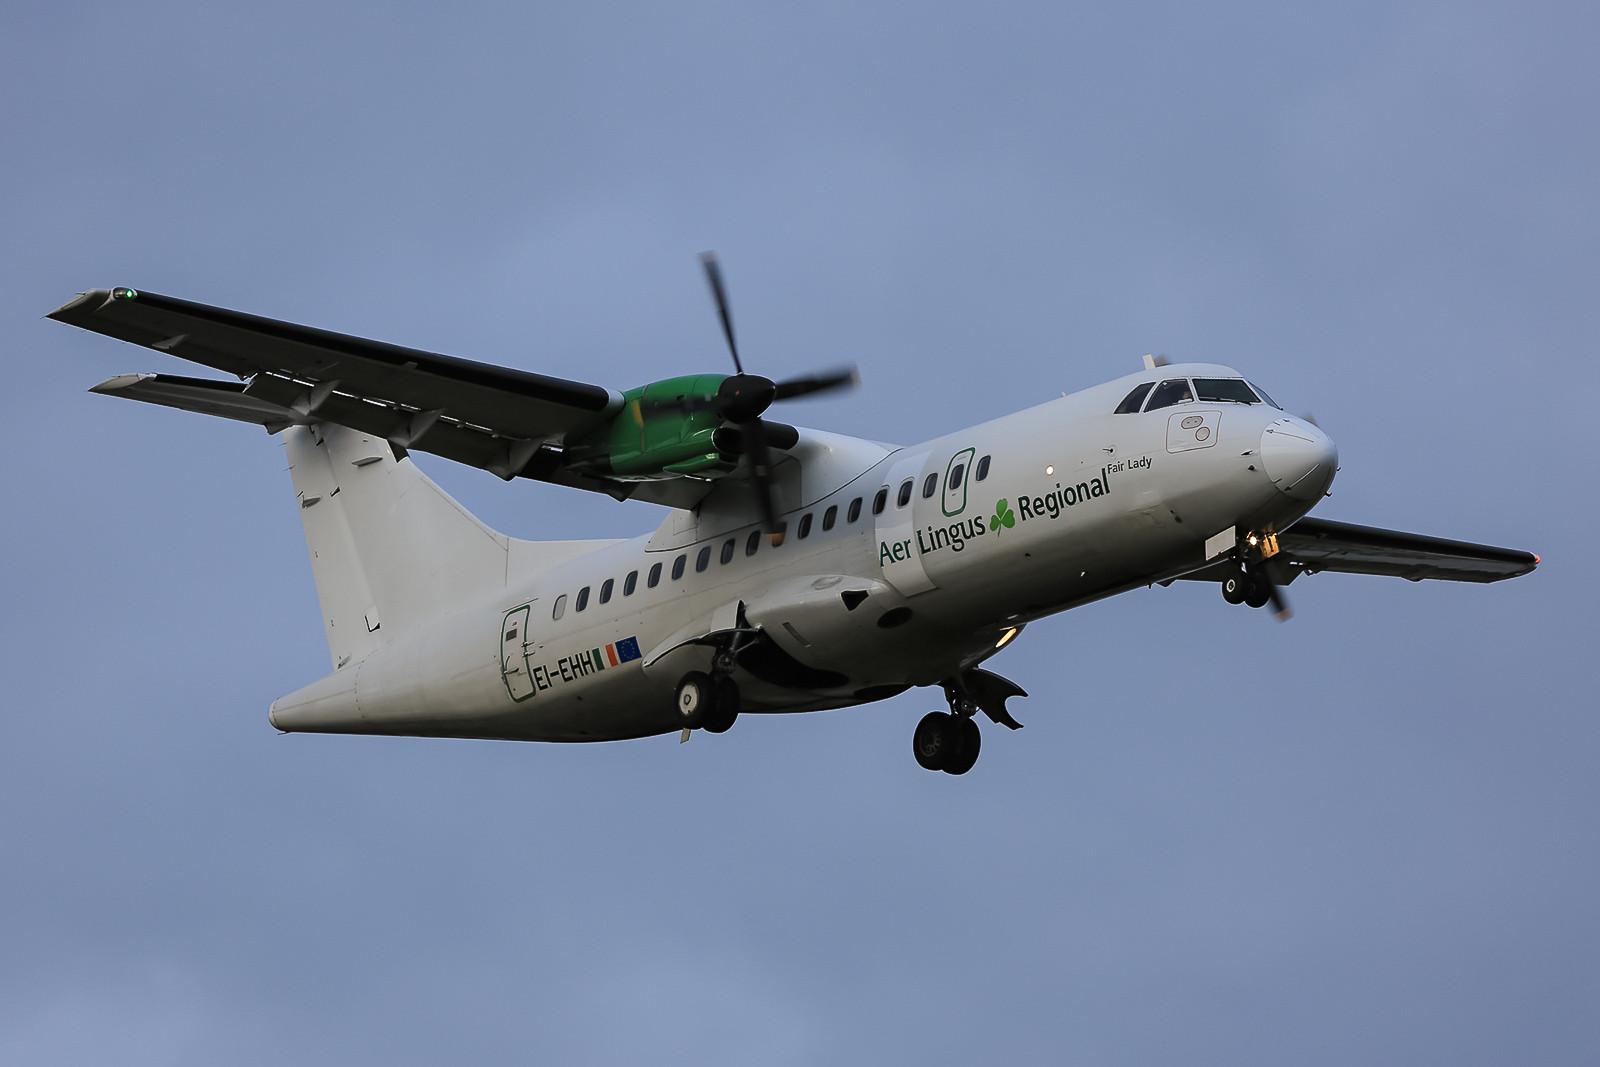 Noch ne ATR von Aer Lingus, diesmal ATR 42